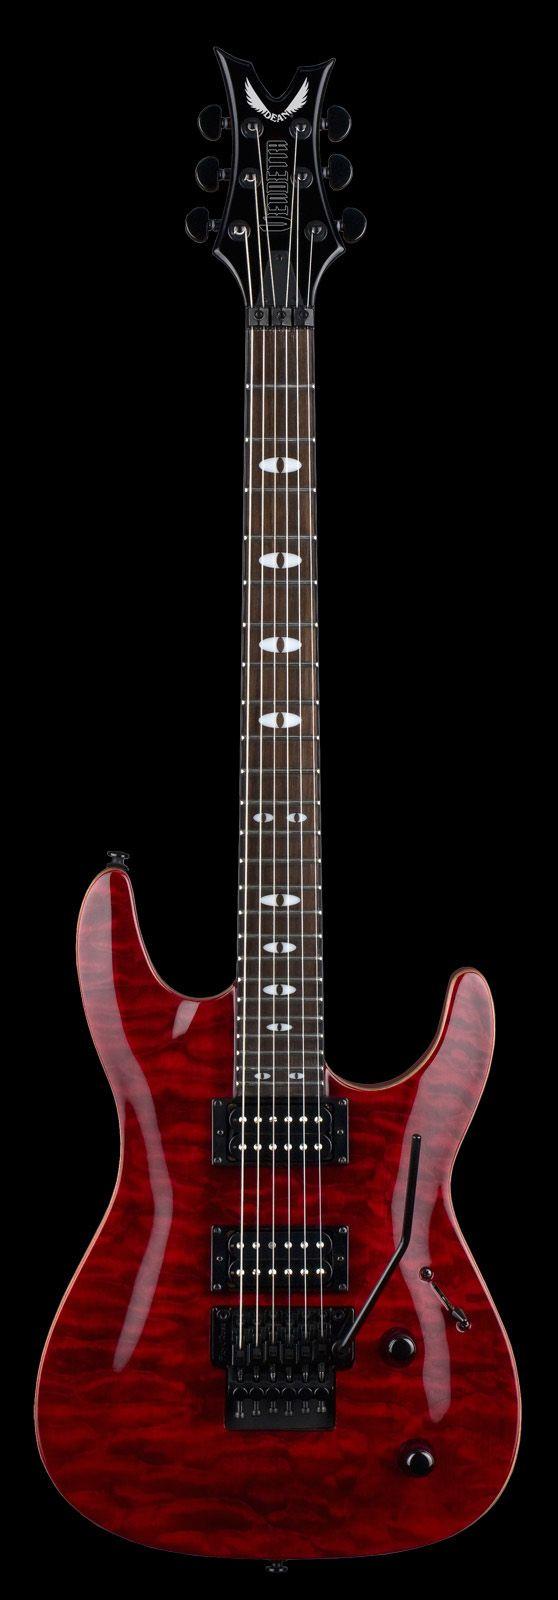 Dean Electric Guitar Vendetta 4f Scary Cherry